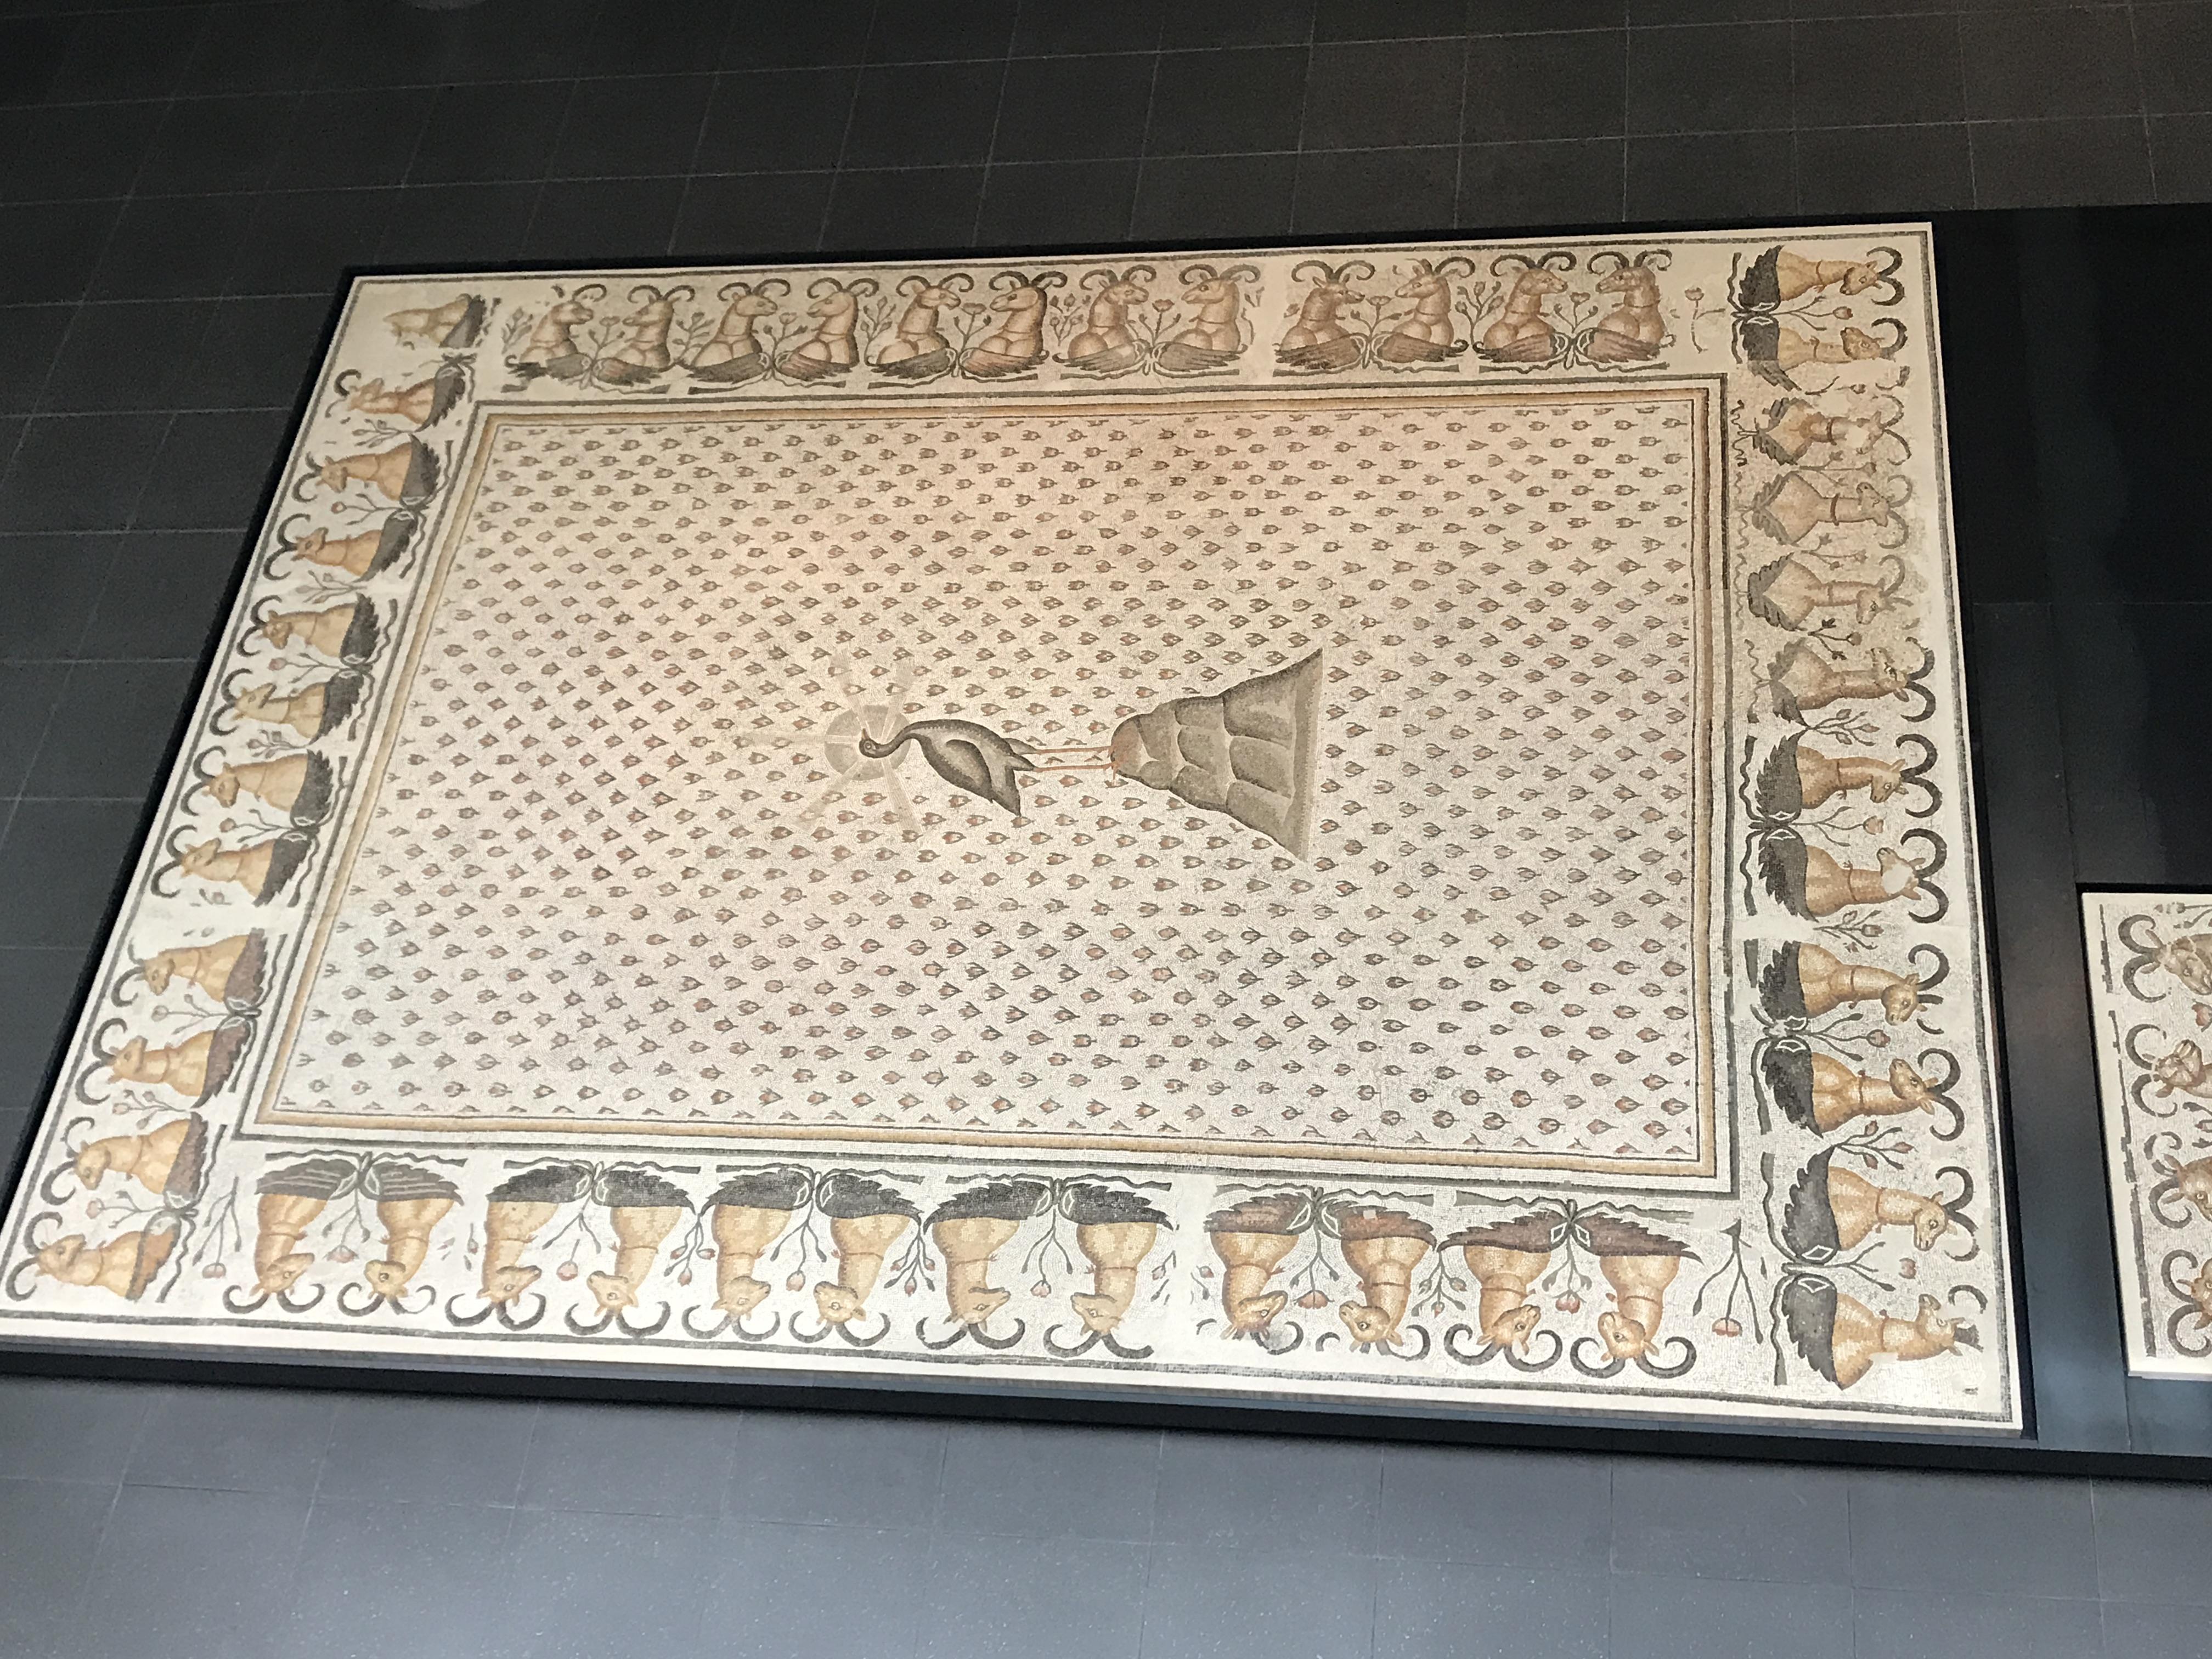 BILDE 4 Føniks Louvre privat